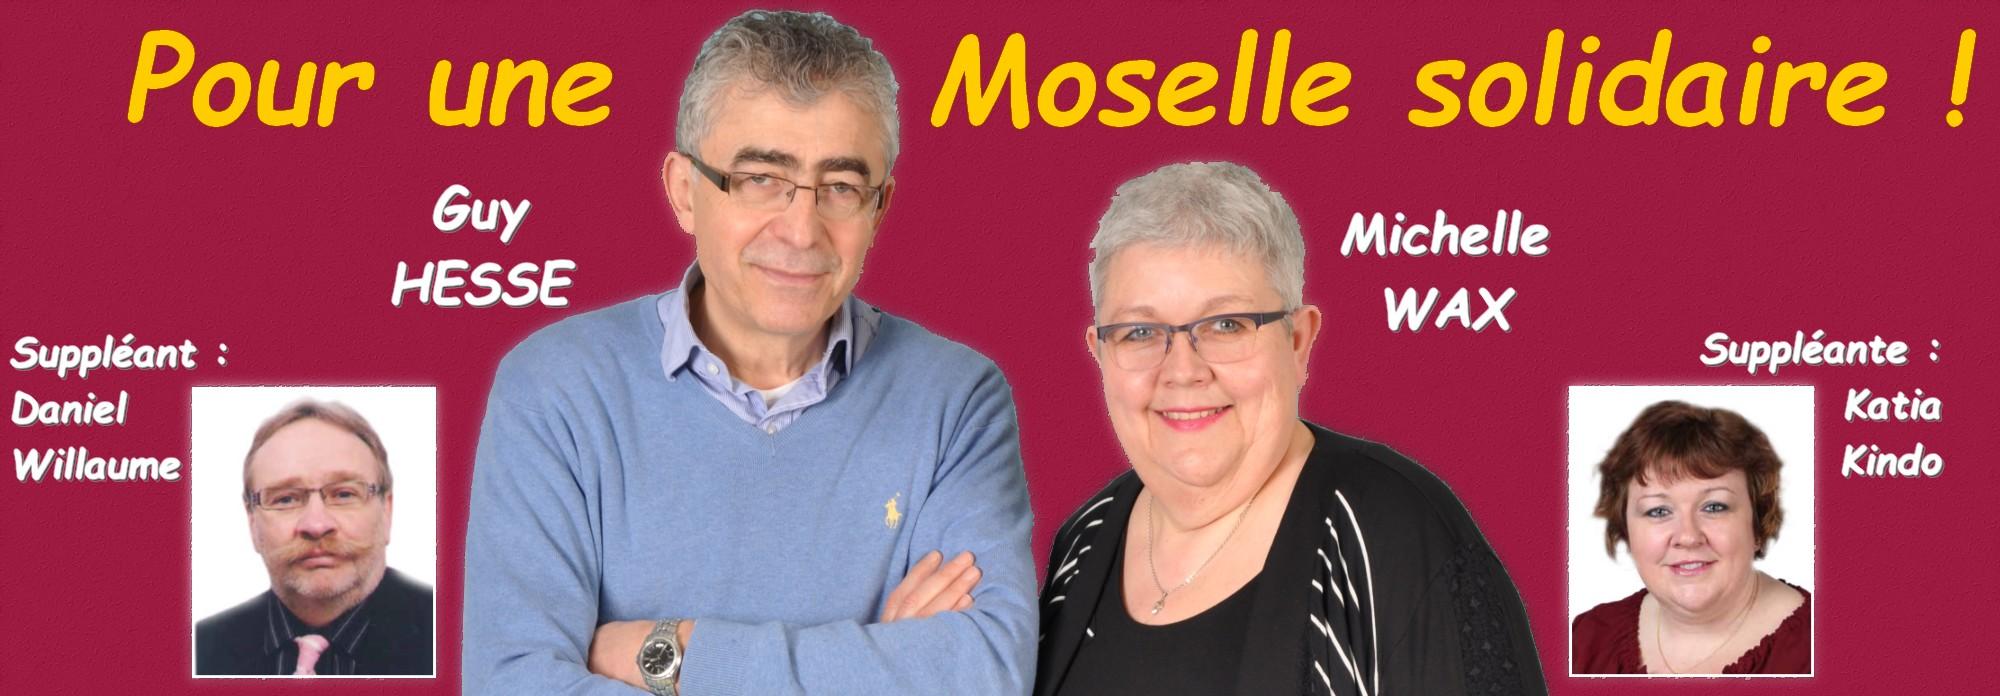 Pour une Moselle solidaire Logo